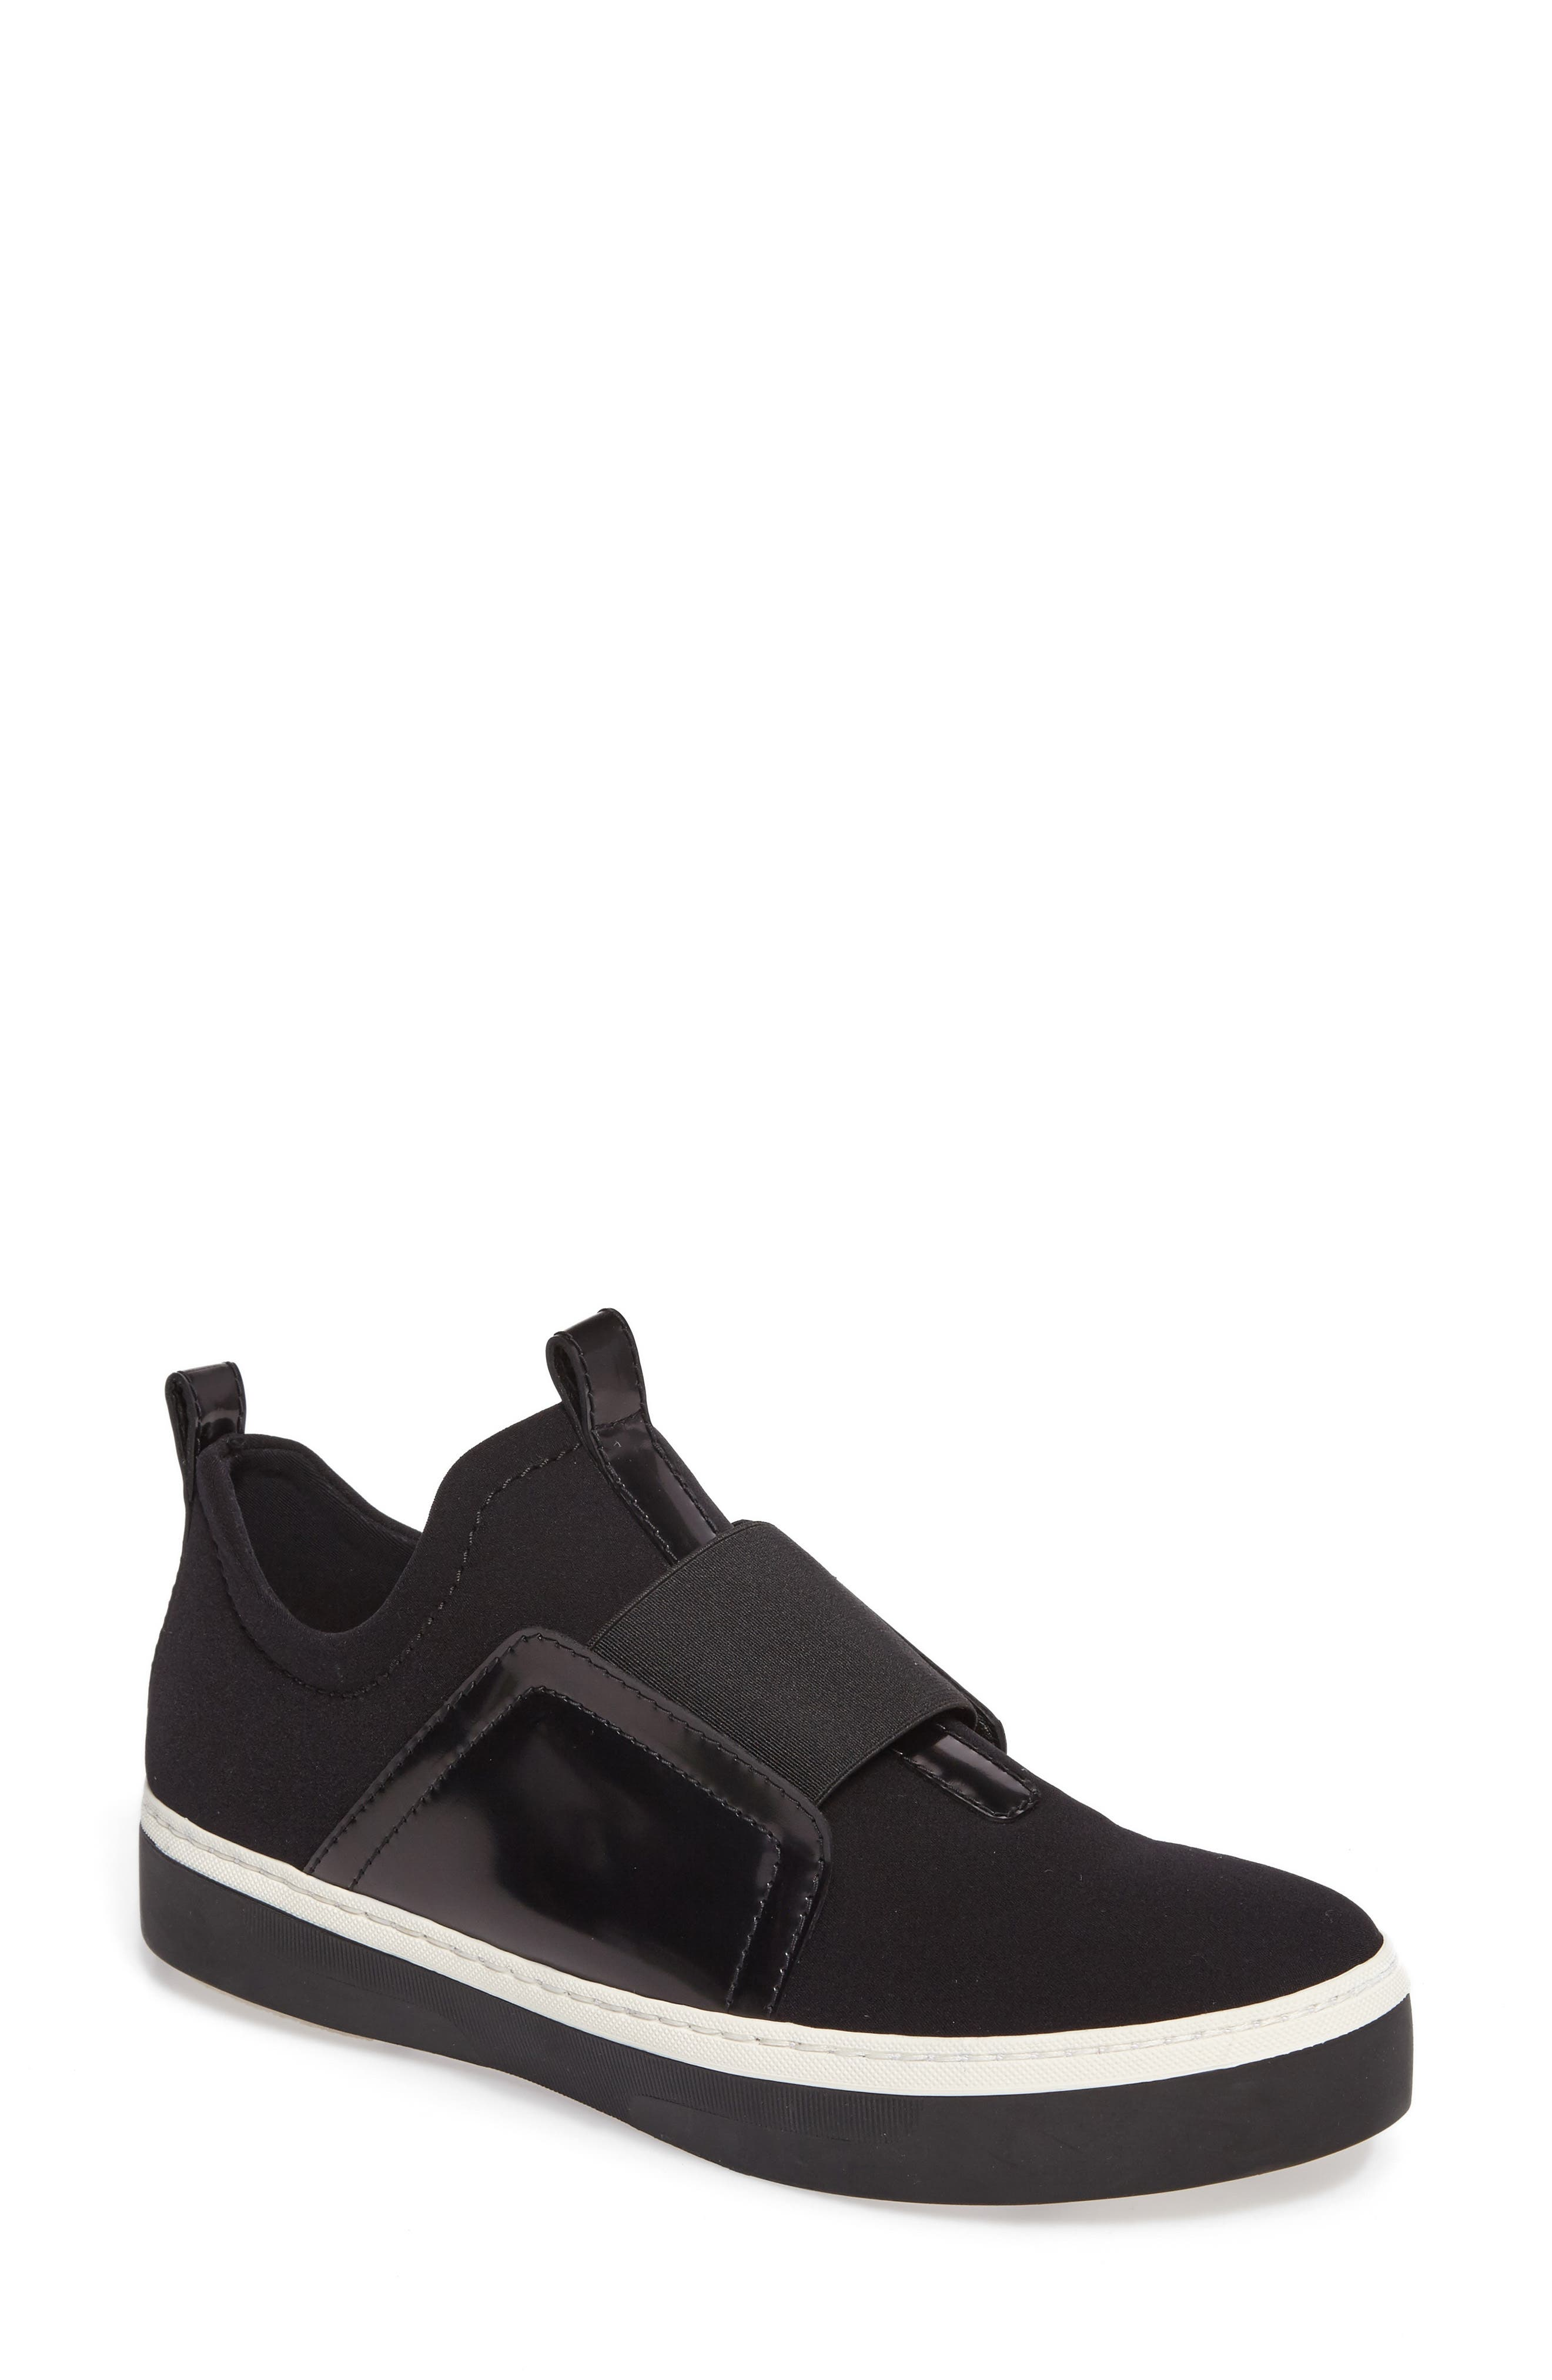 Wayfare Slip-On Sneaker,                         Main,                         color, Black Neoprene